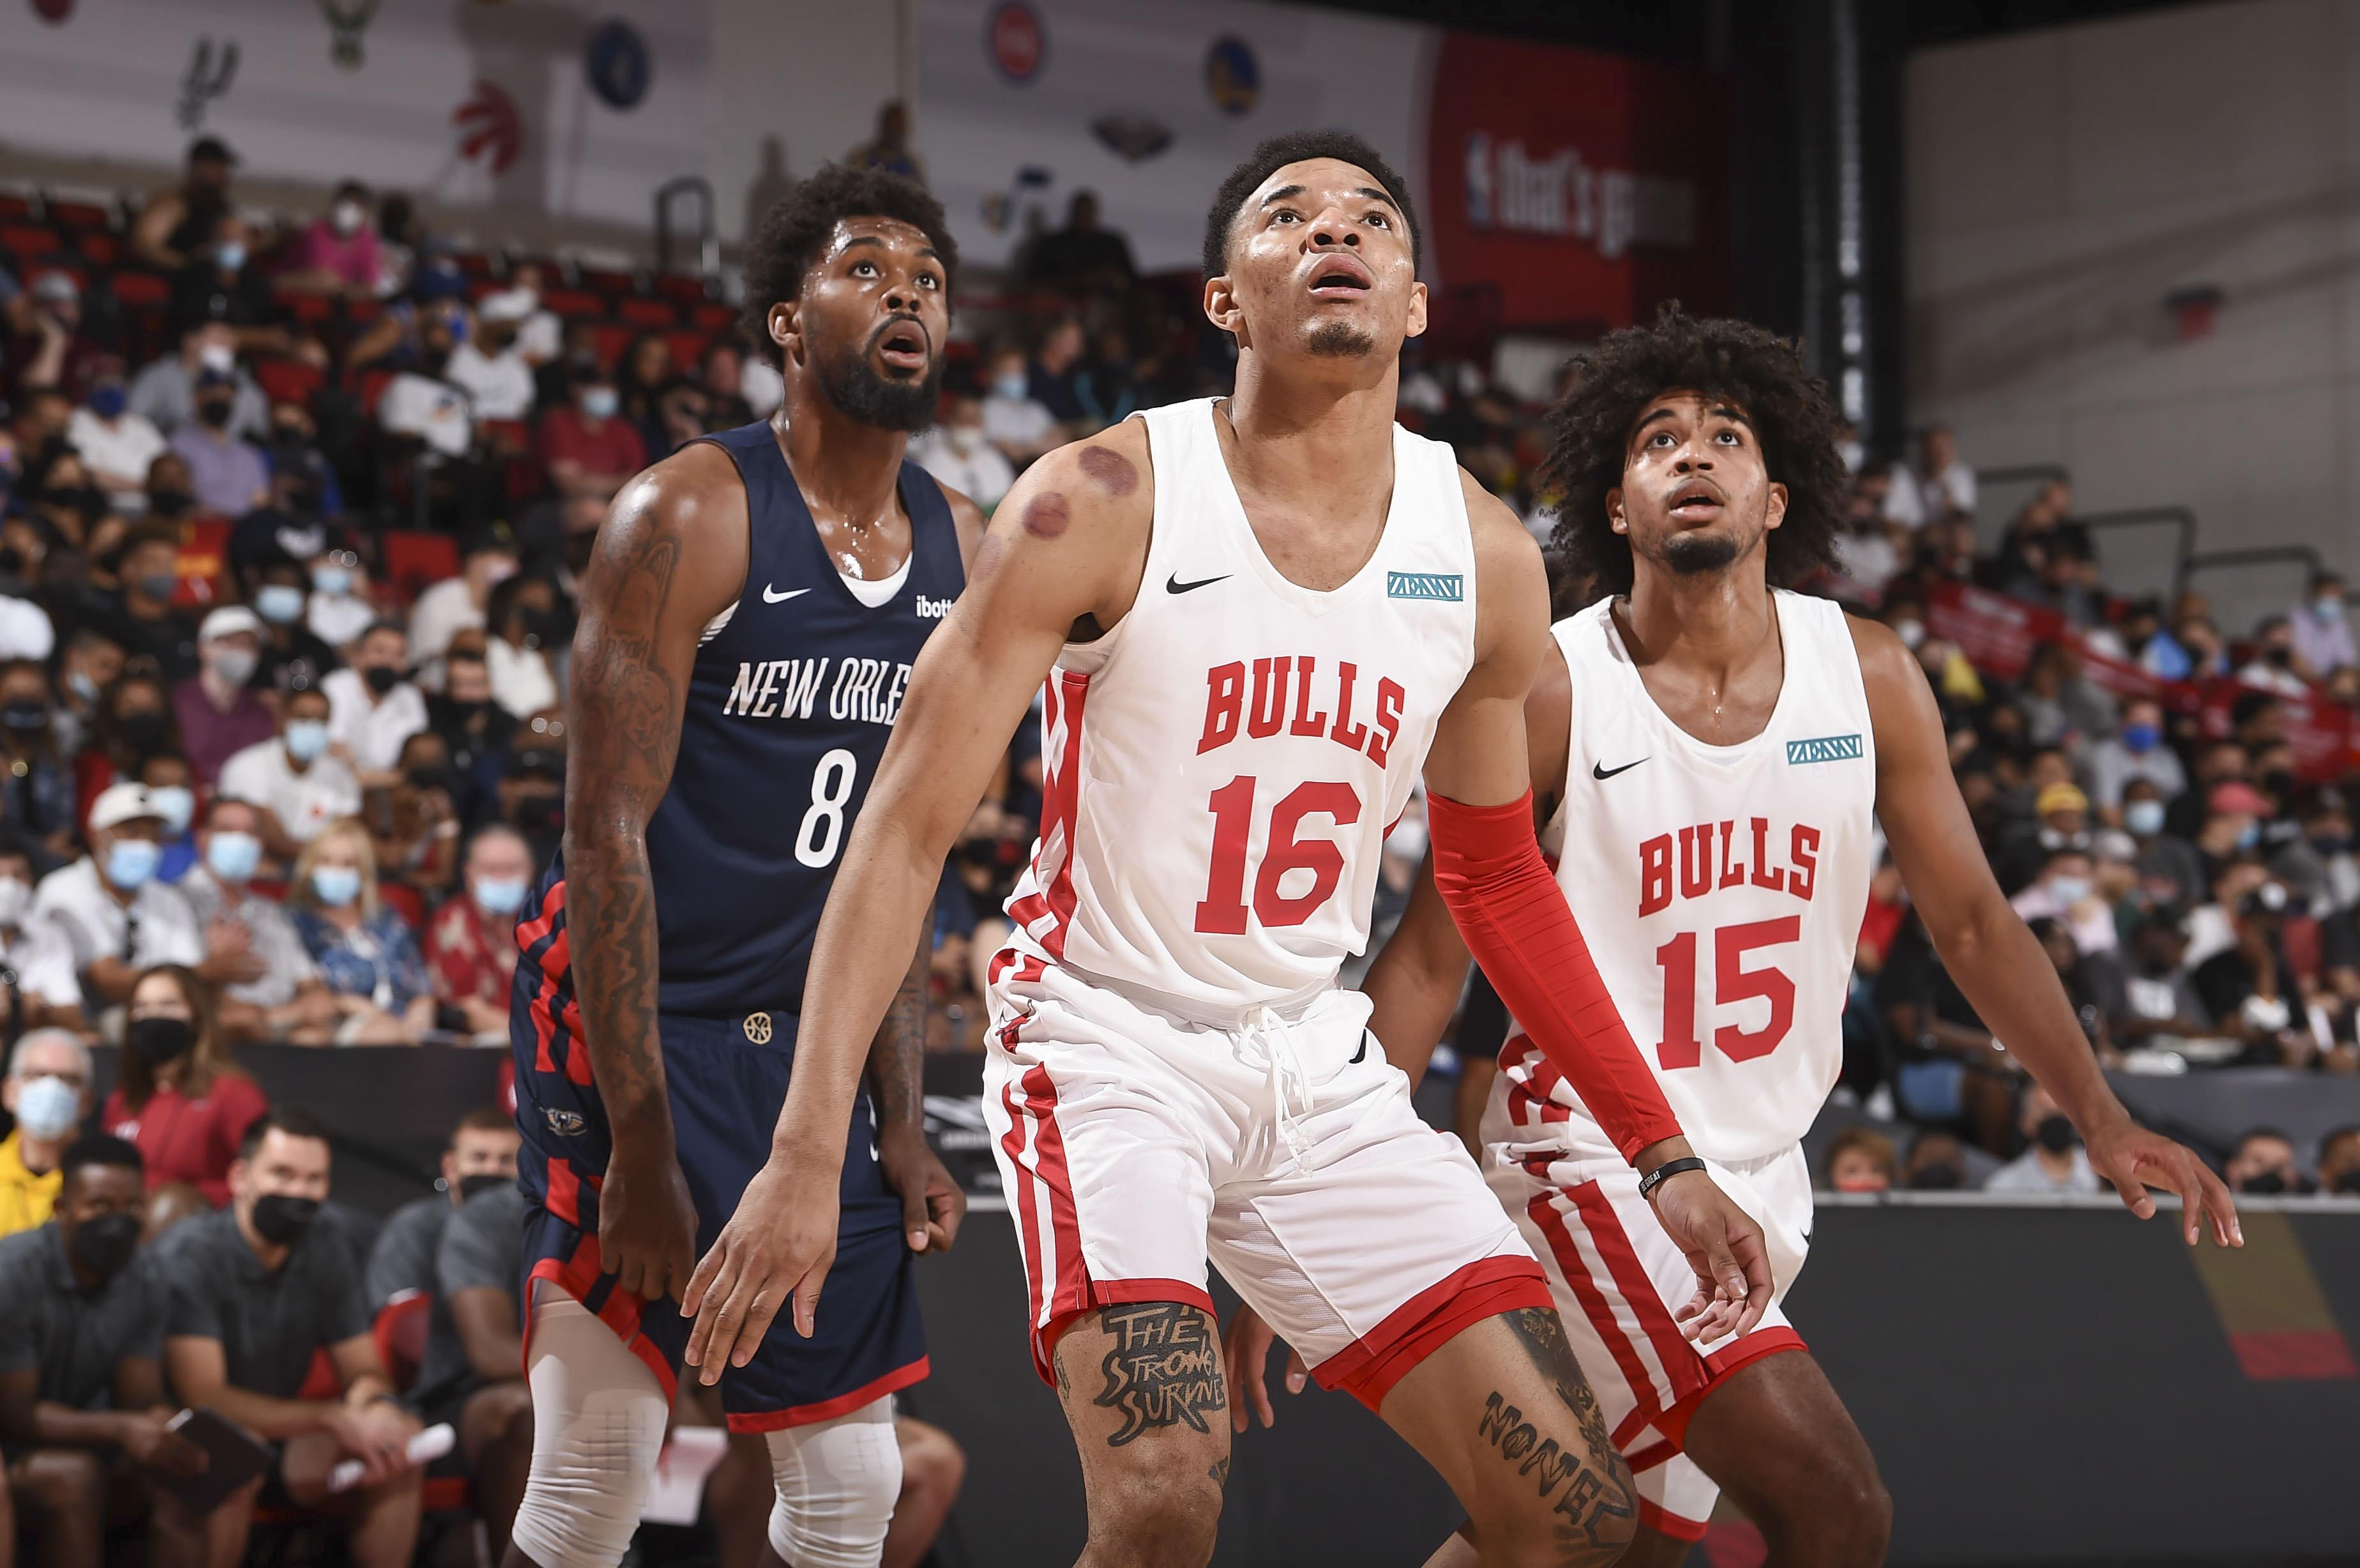 2021 Las Vegas Summer League - New Orleans Pelicans v Chicago Bulls